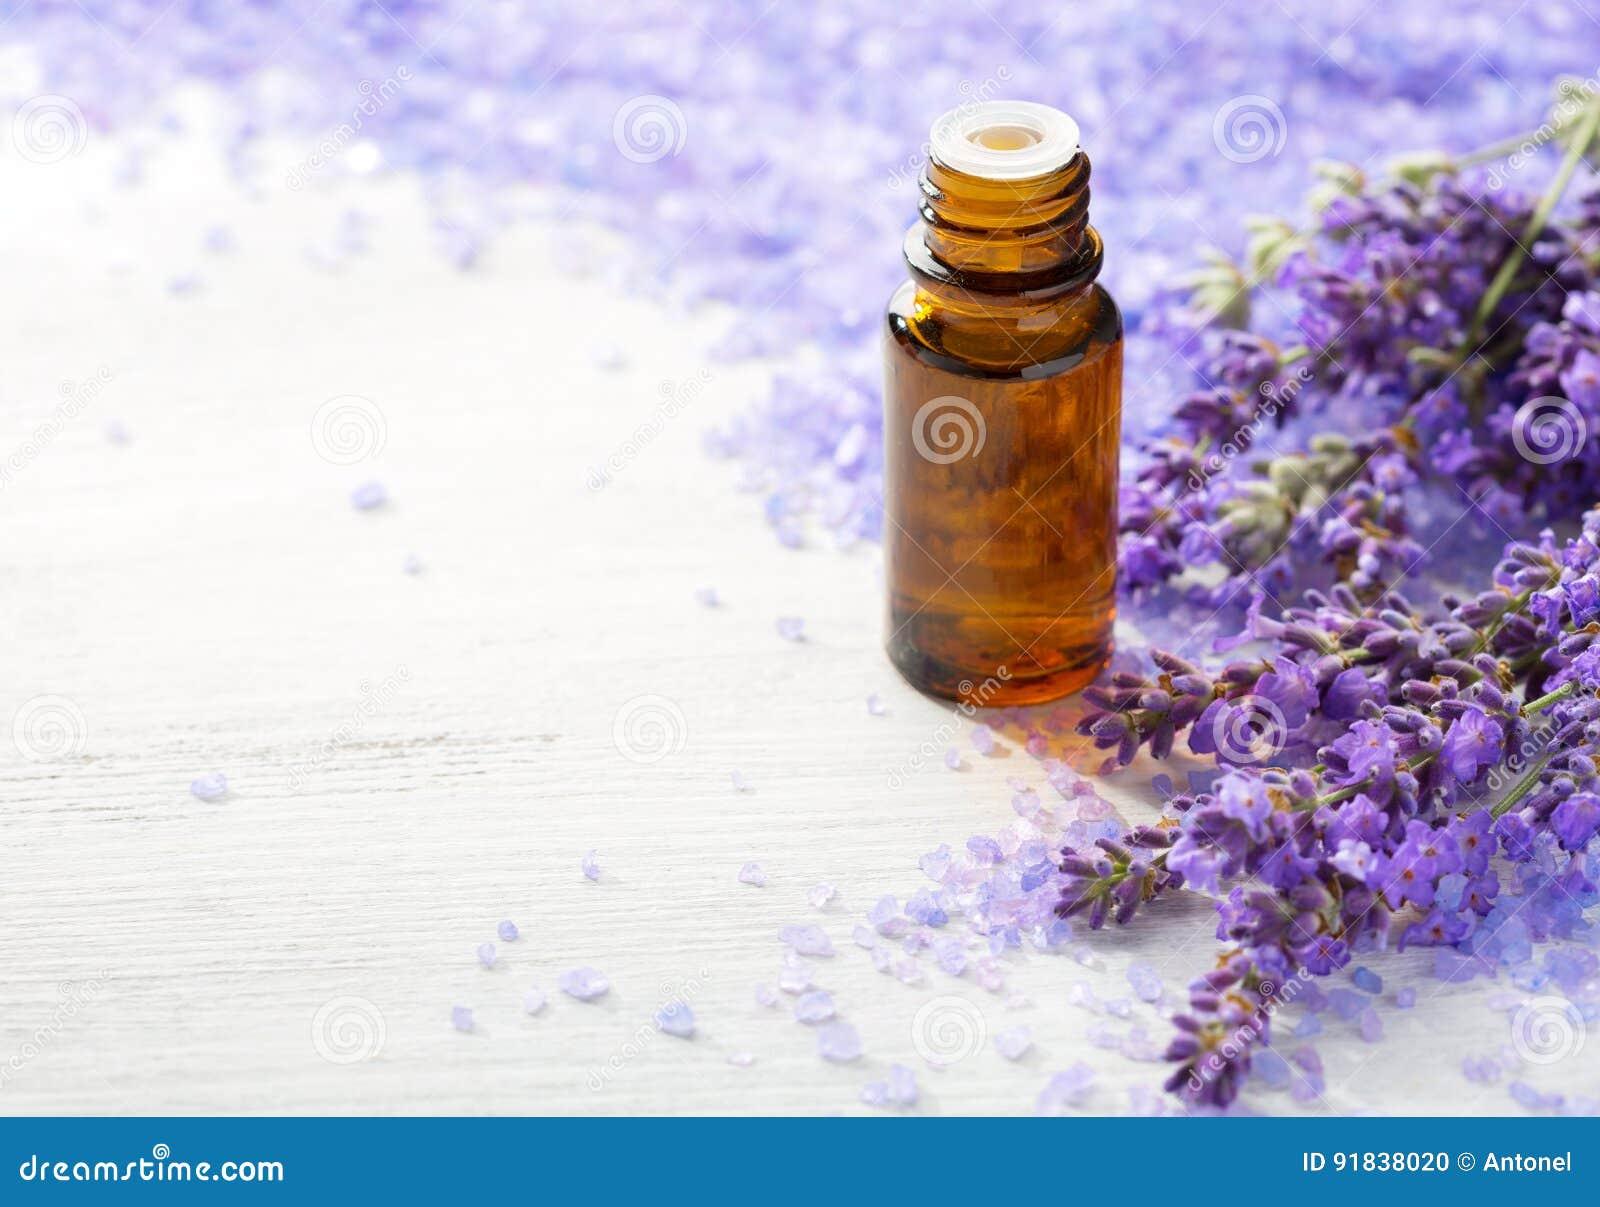 Lavender ουσιαστικό έλαιο, κλαδάκια lavender και ορυκτά άλατα λουτρών στον ξύλινο πίνακα Εκλεκτική εστίαση